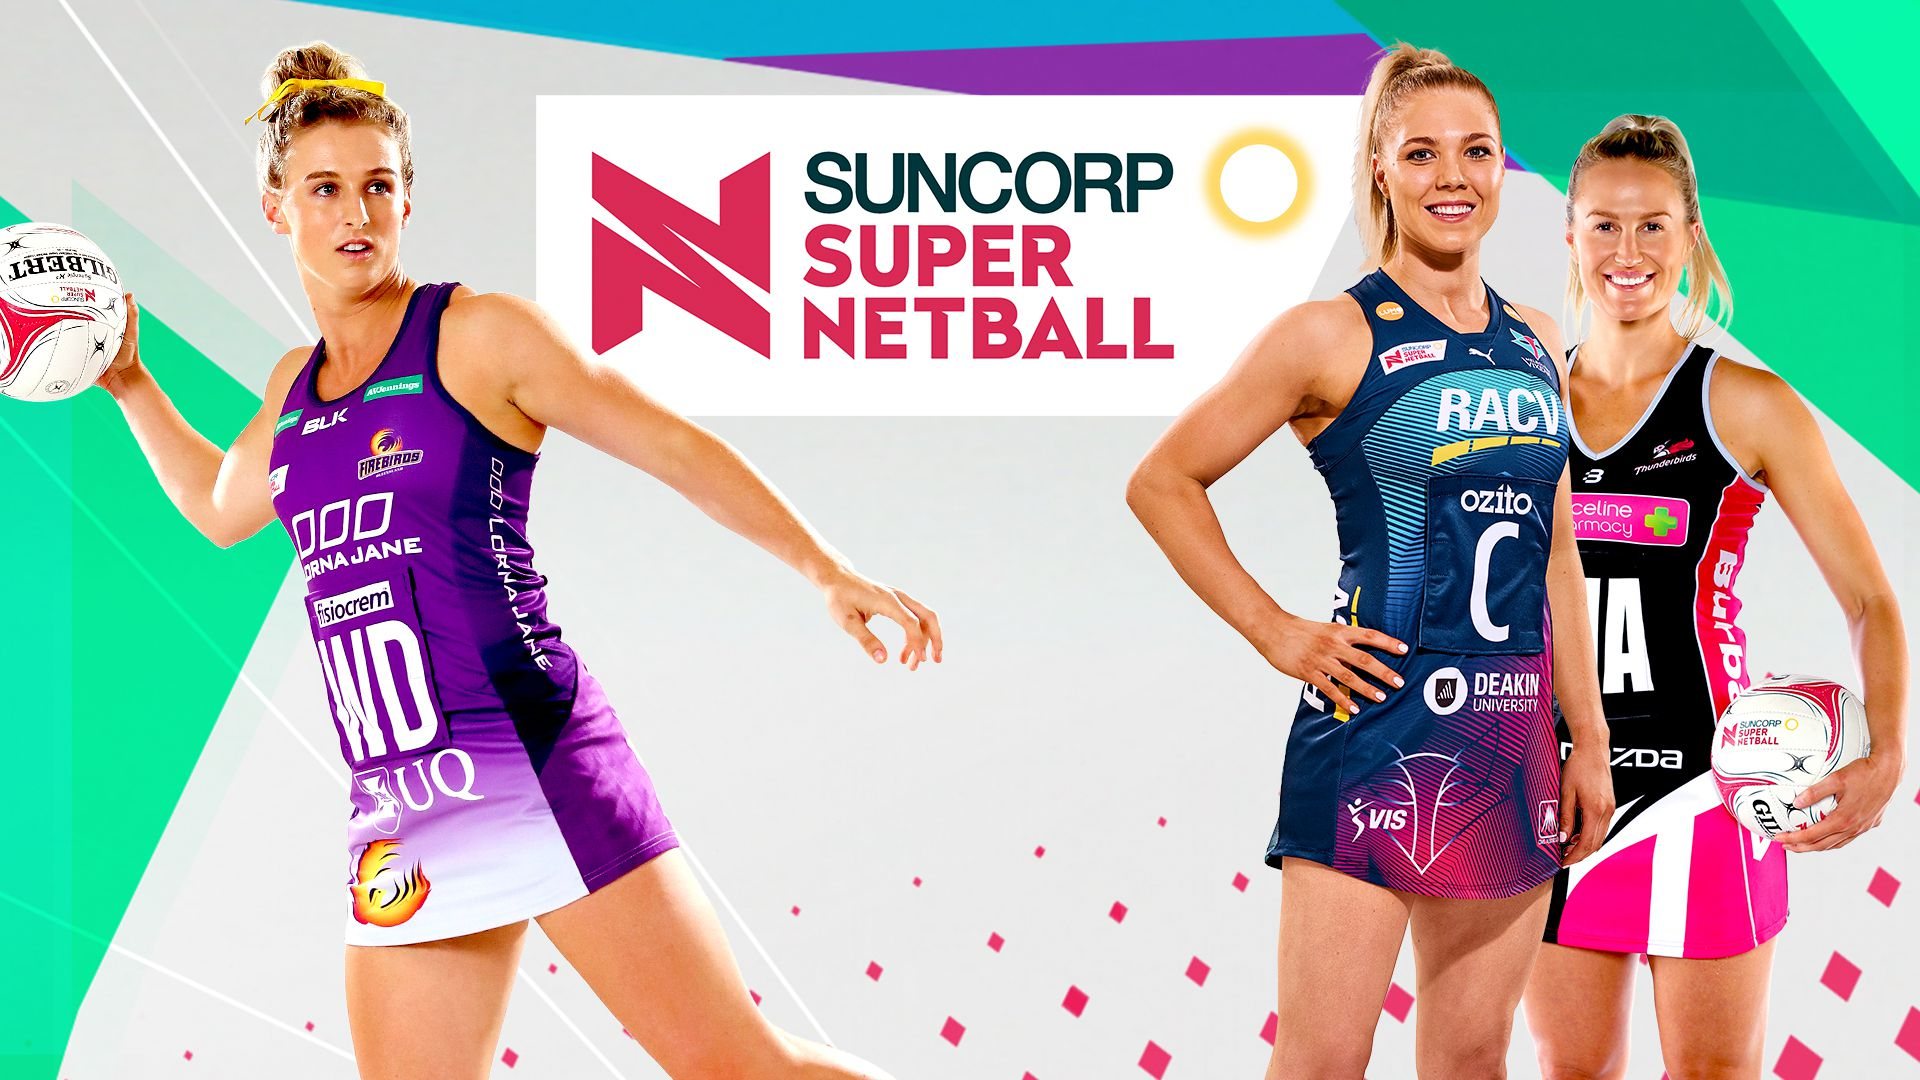 Watch Suncorp Super Netball 2019, Catch Up TV